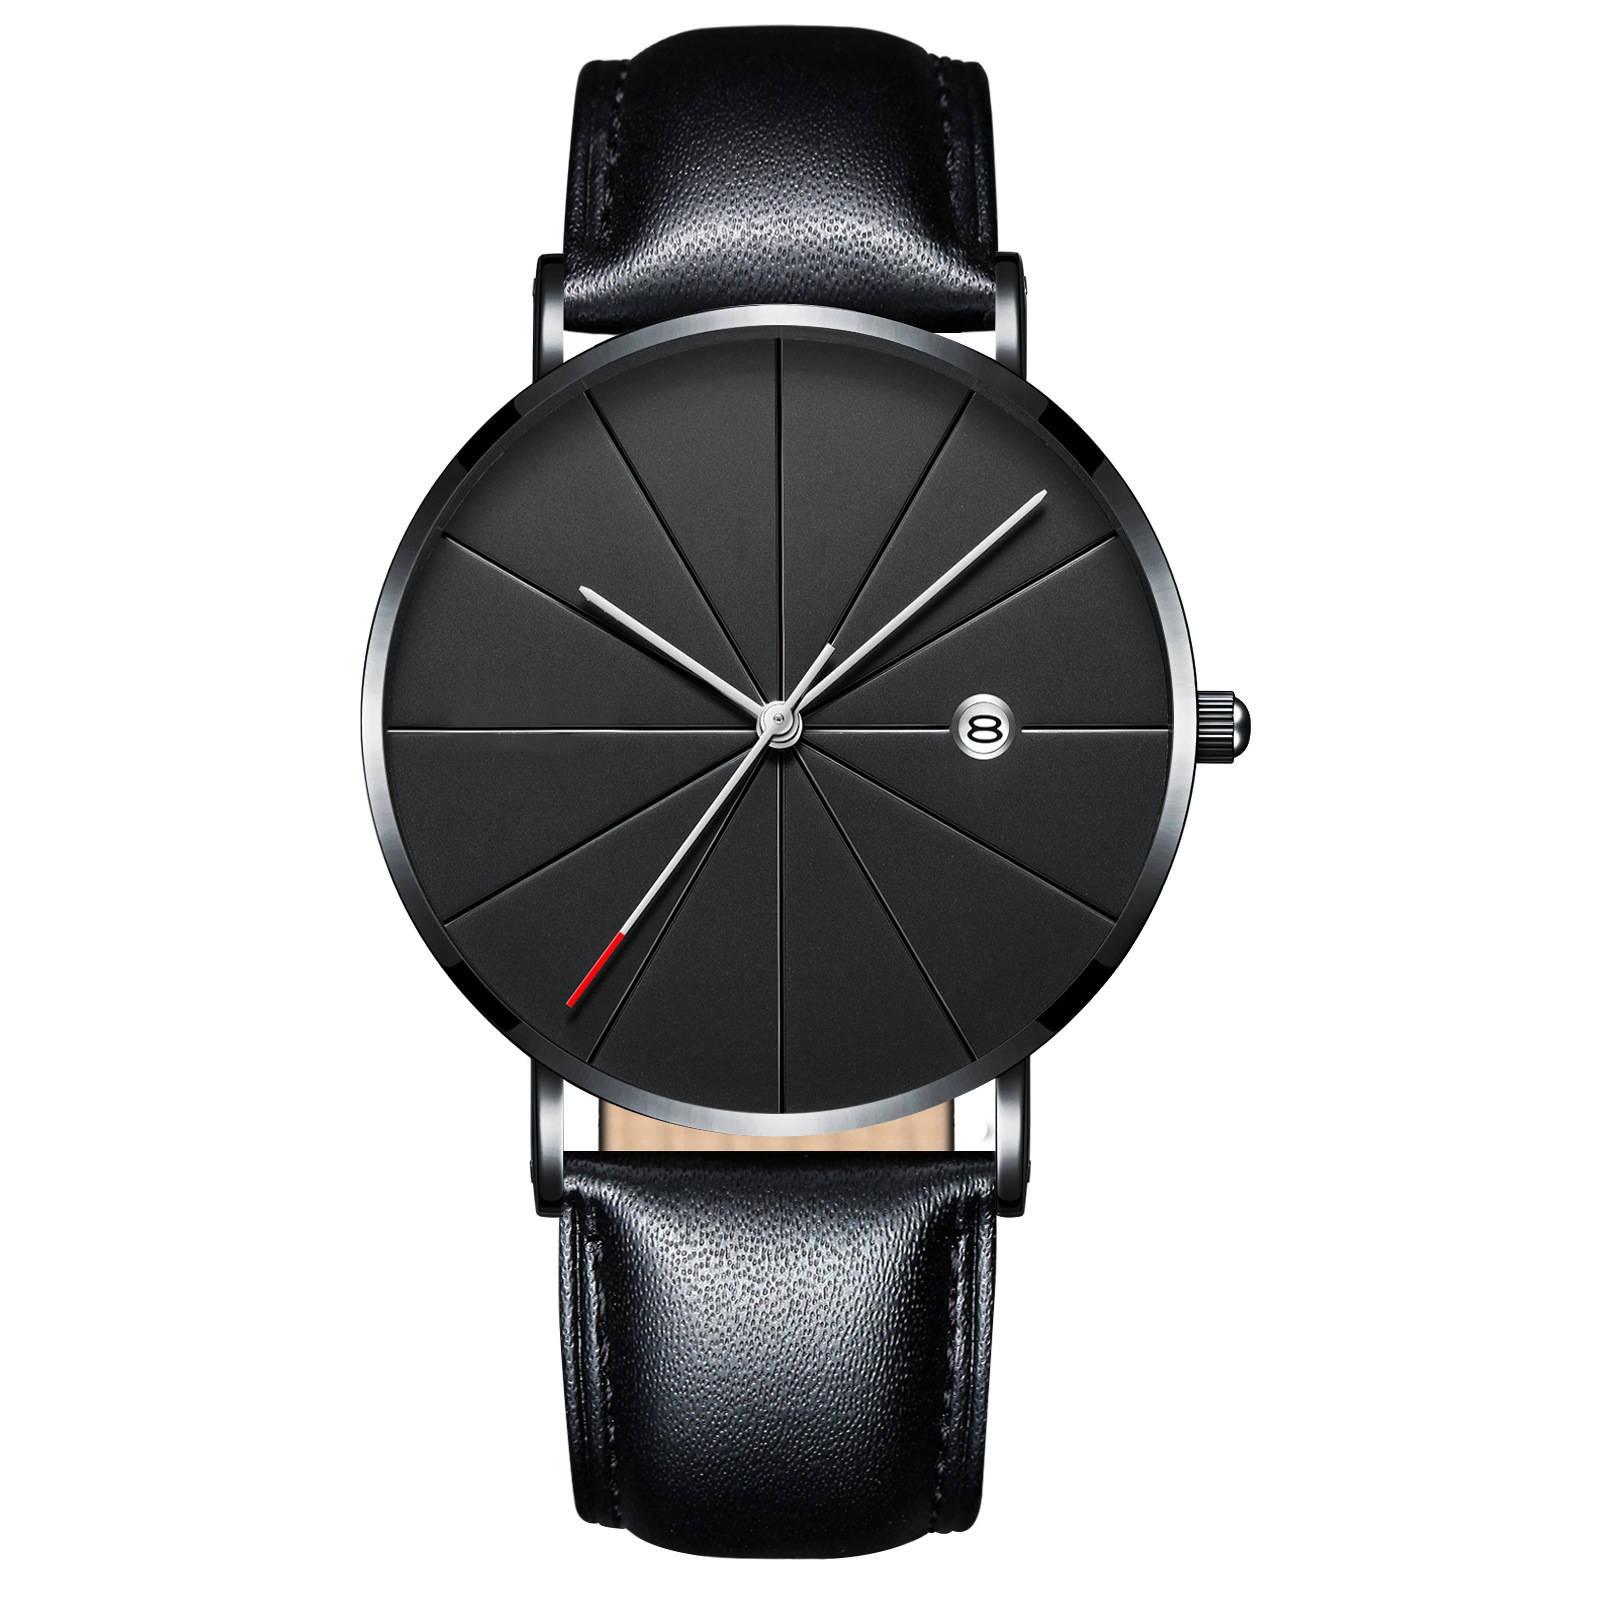 Luxury Watches Men Blue Stainless Steel Ultra Thin Watches Men Classic Quartz Date Men's Wrist Watch black+rose gold 25cm 1